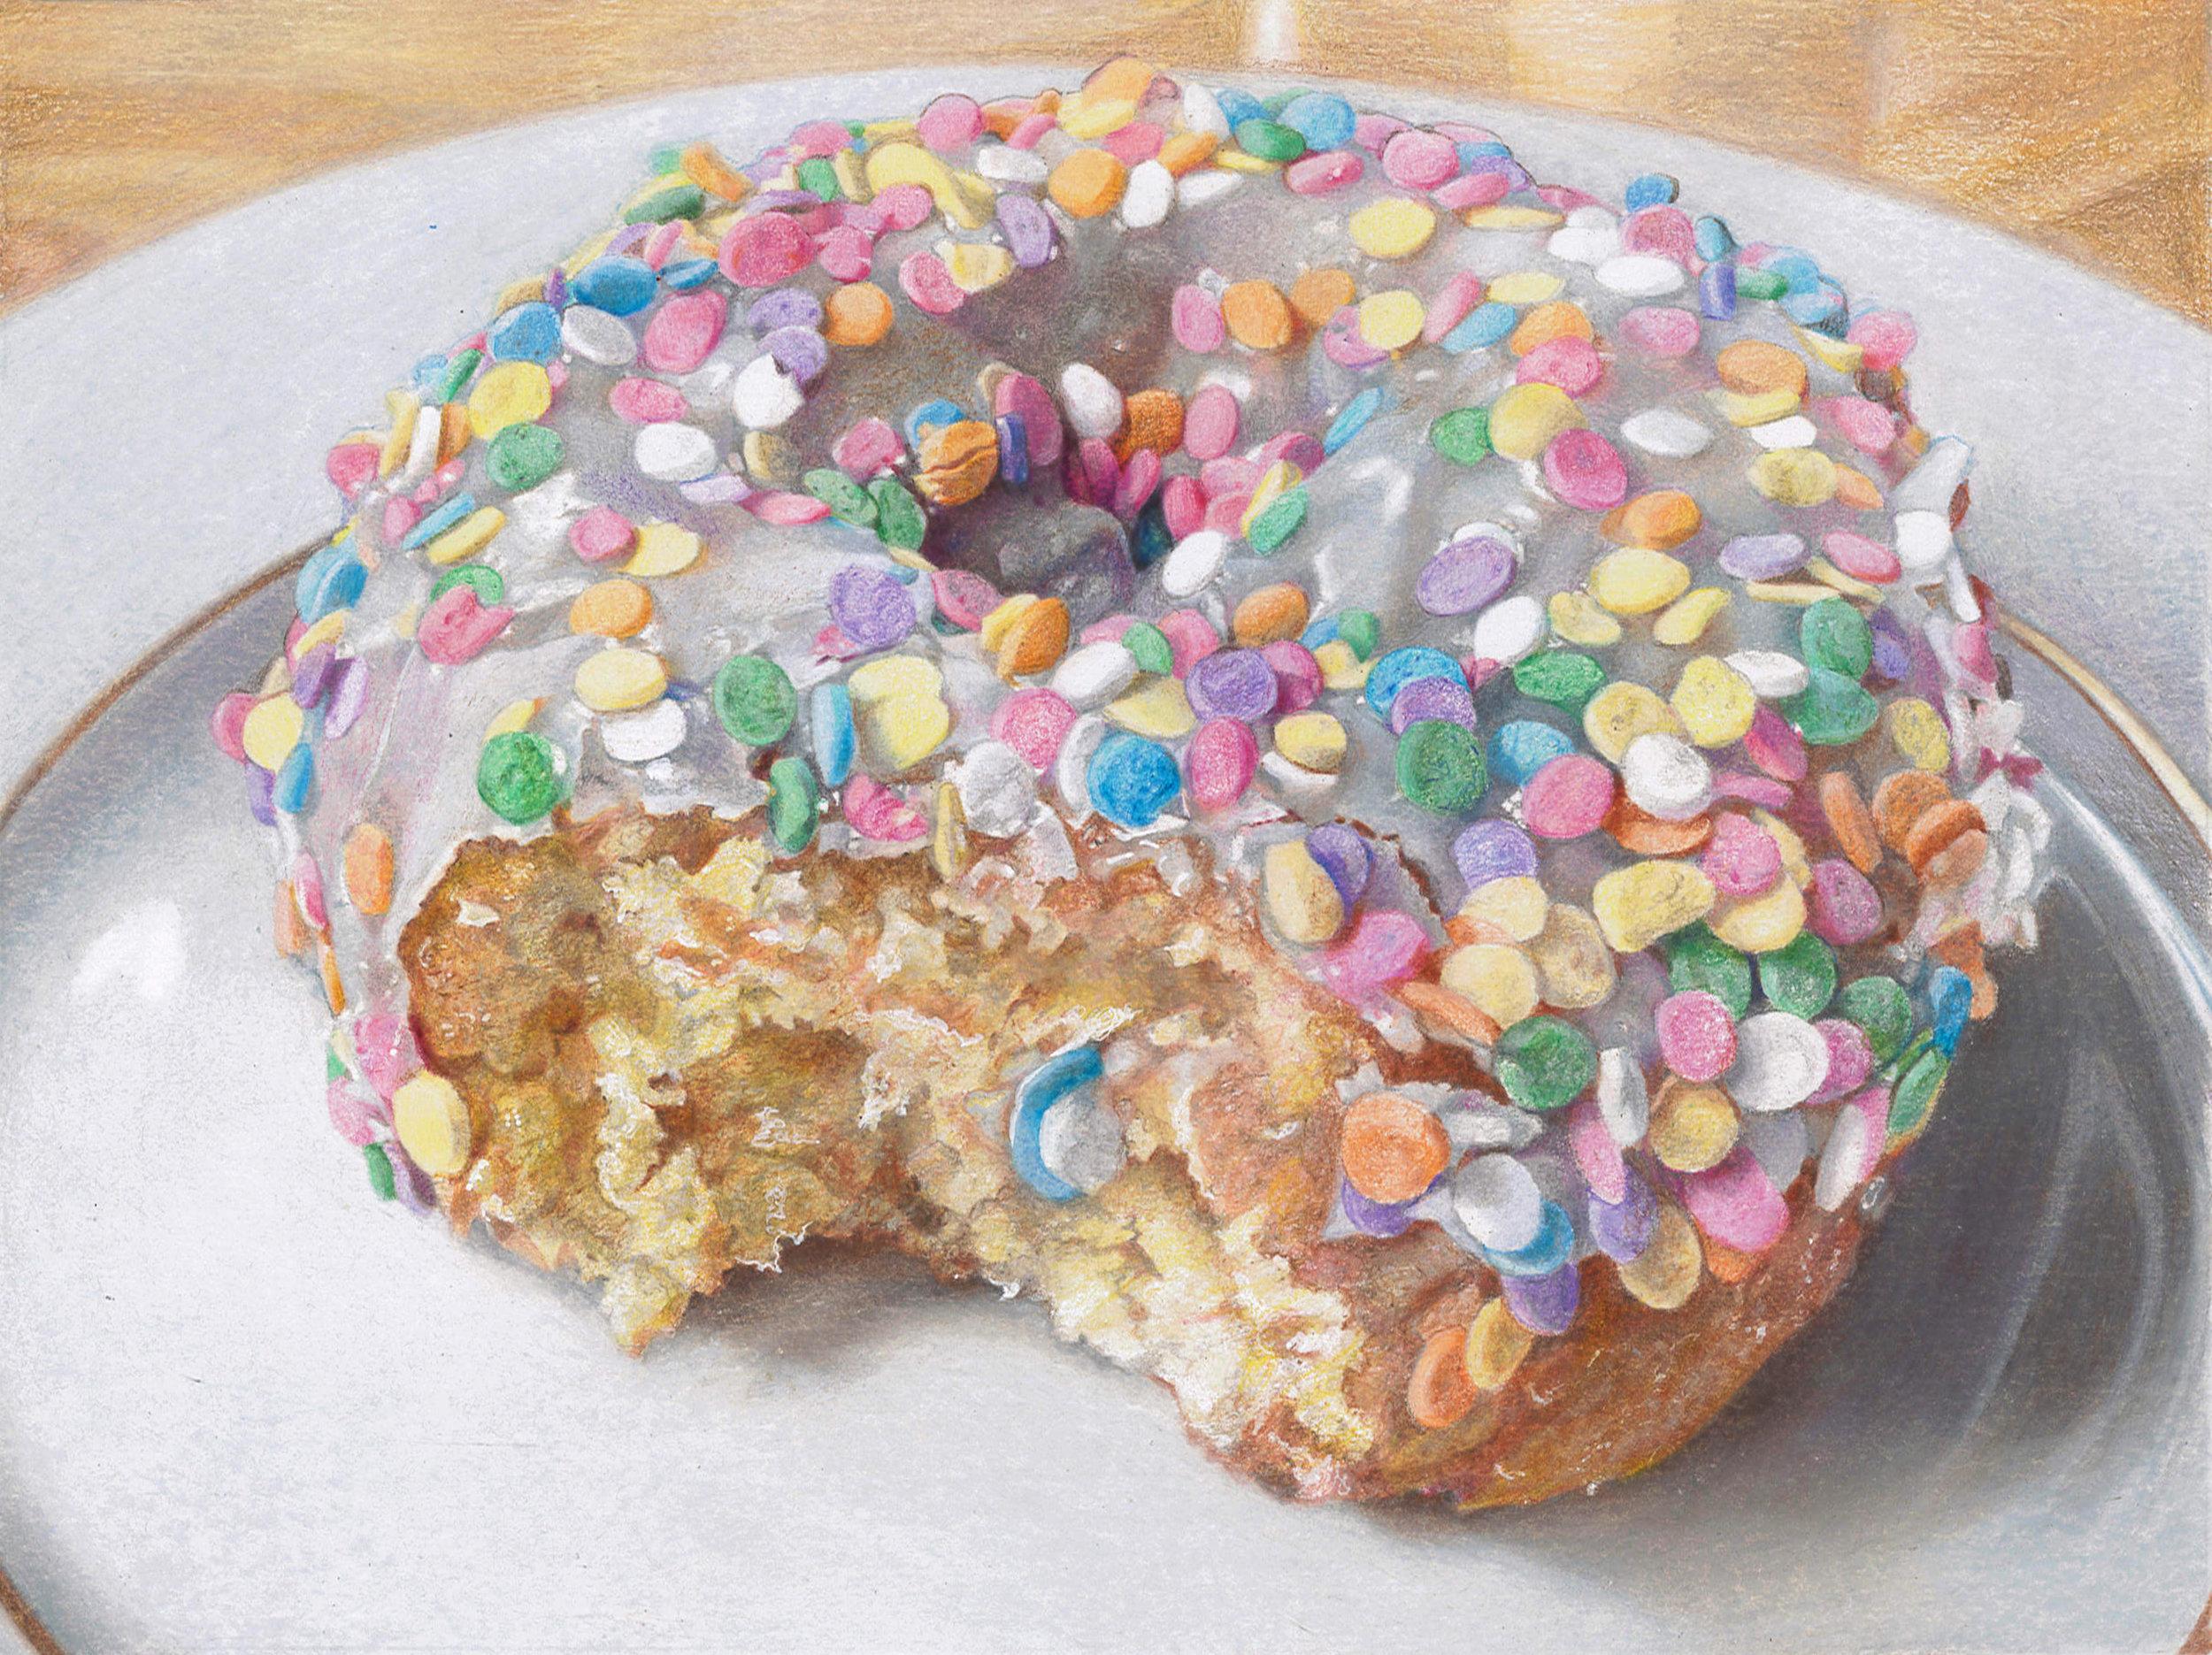 Large Donut with sprinkles edited.jpg